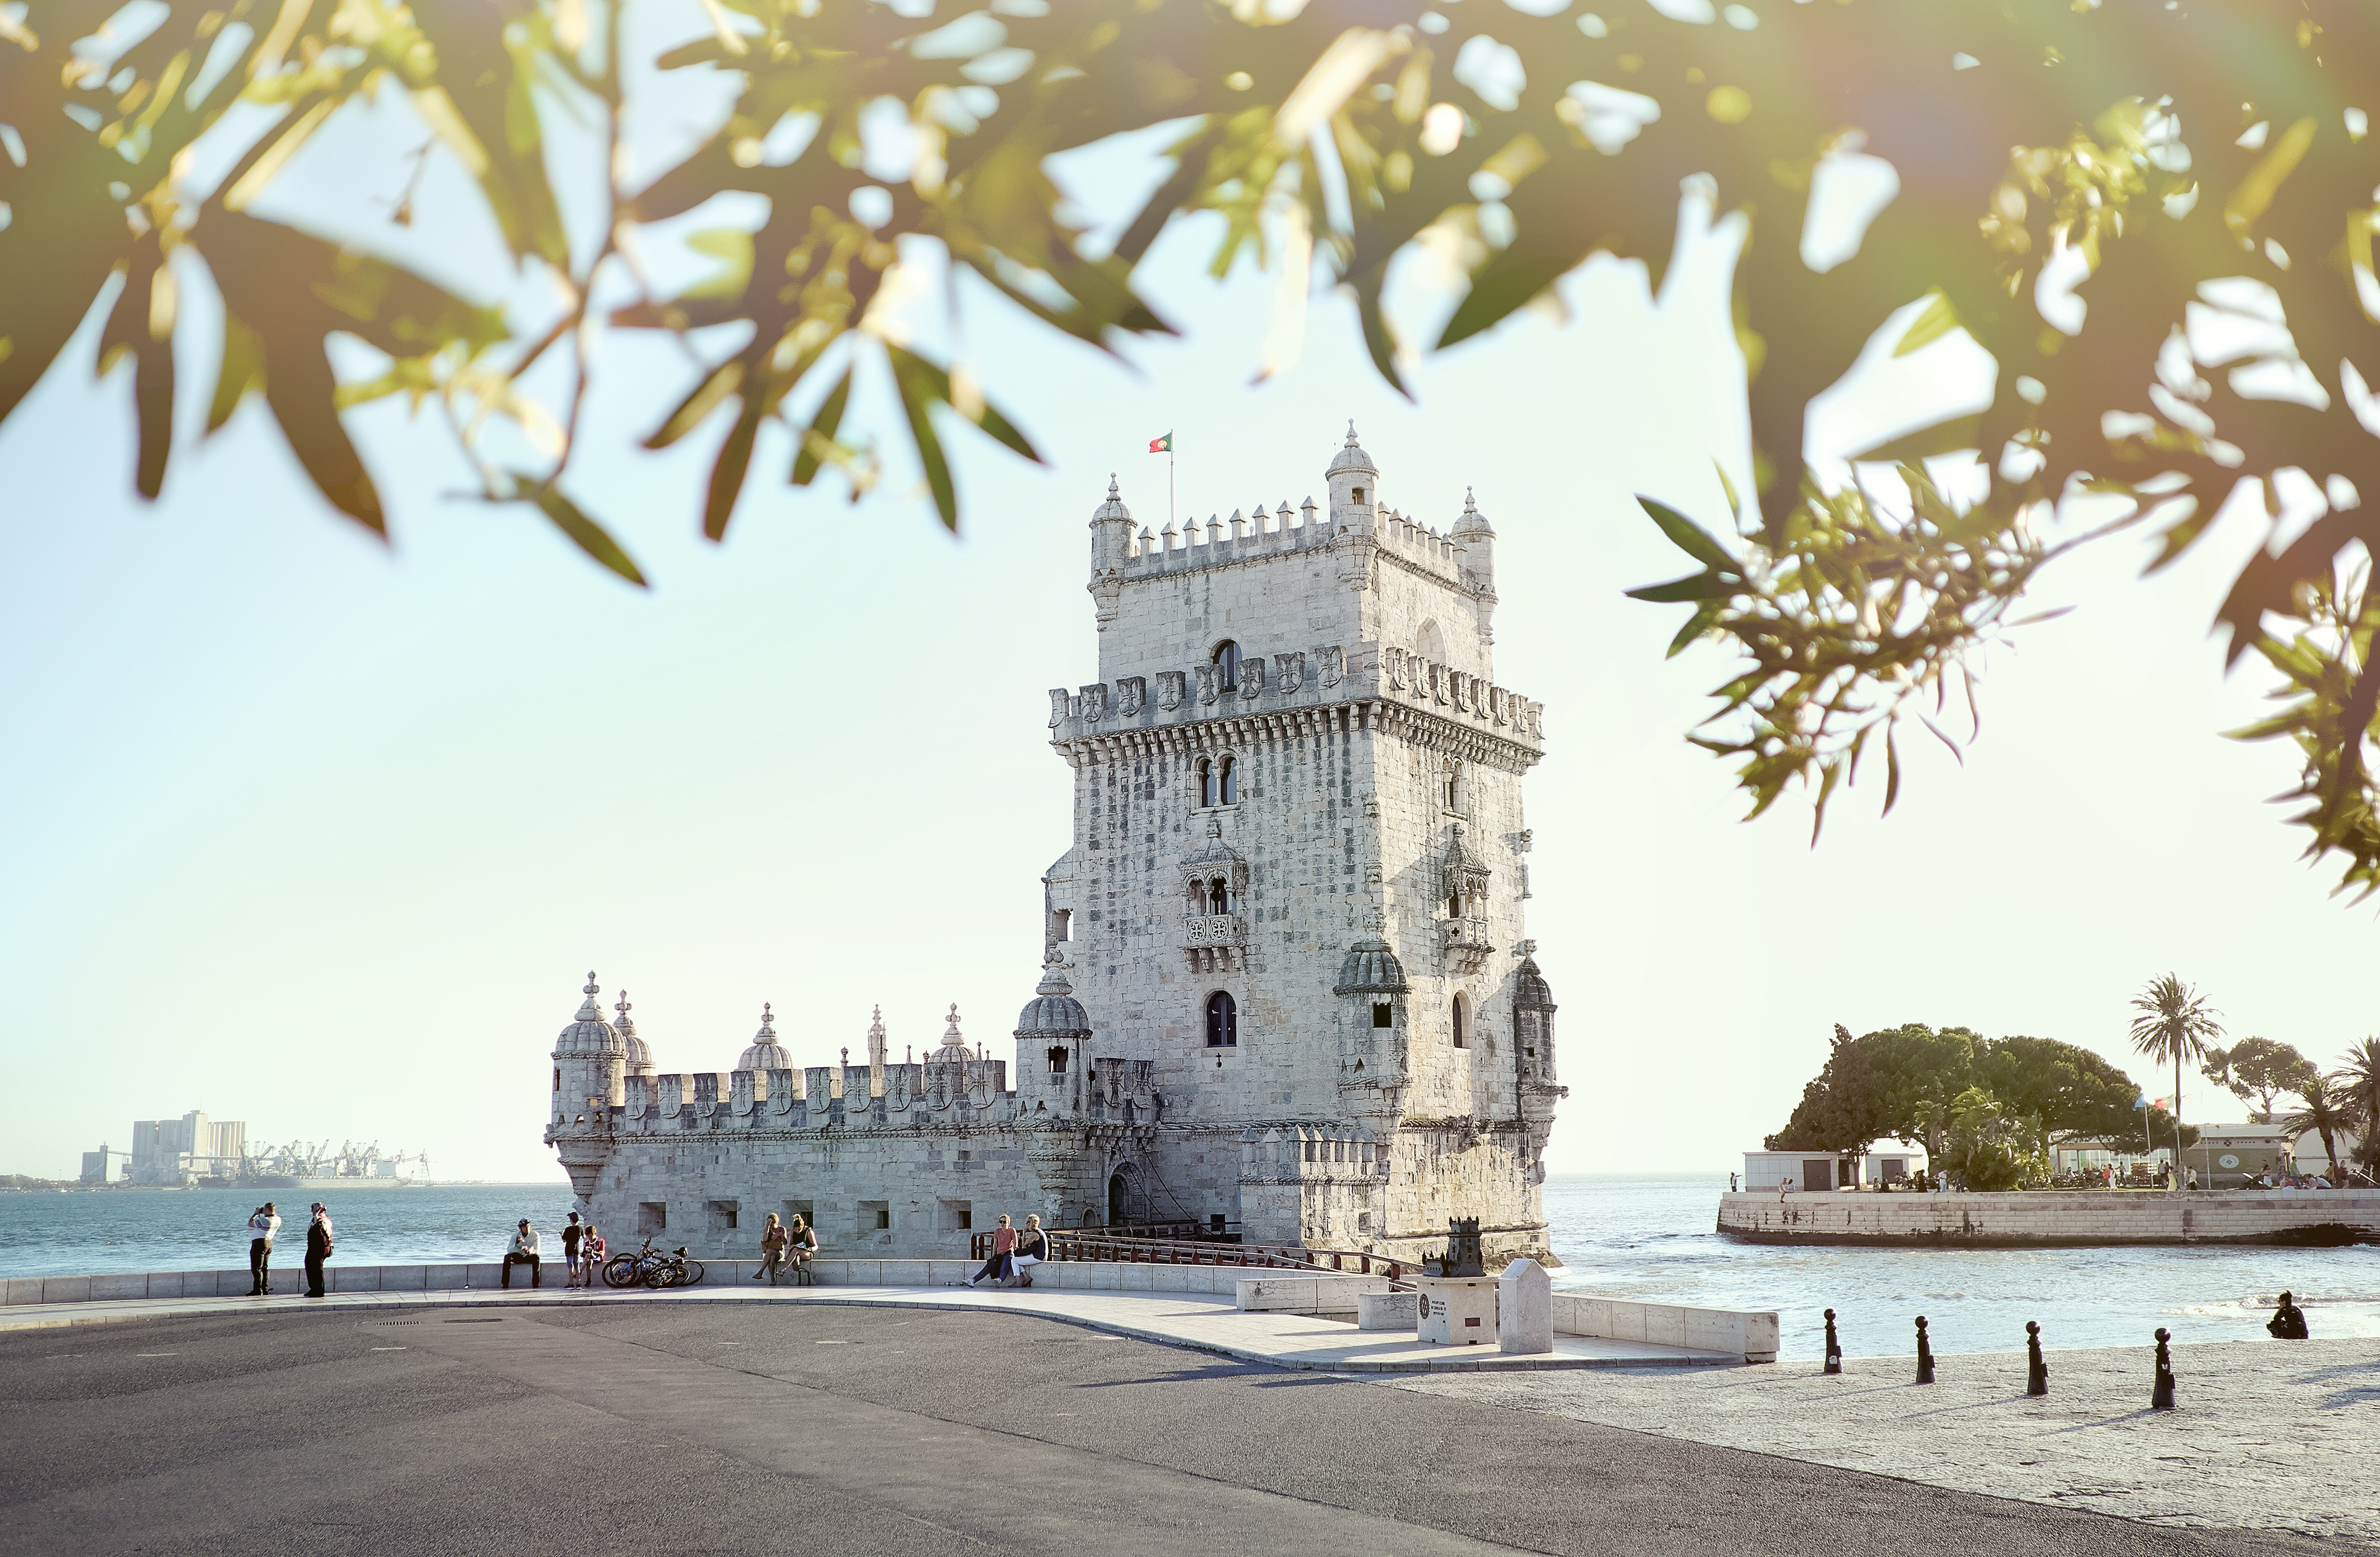 A histórica Torre de Belém